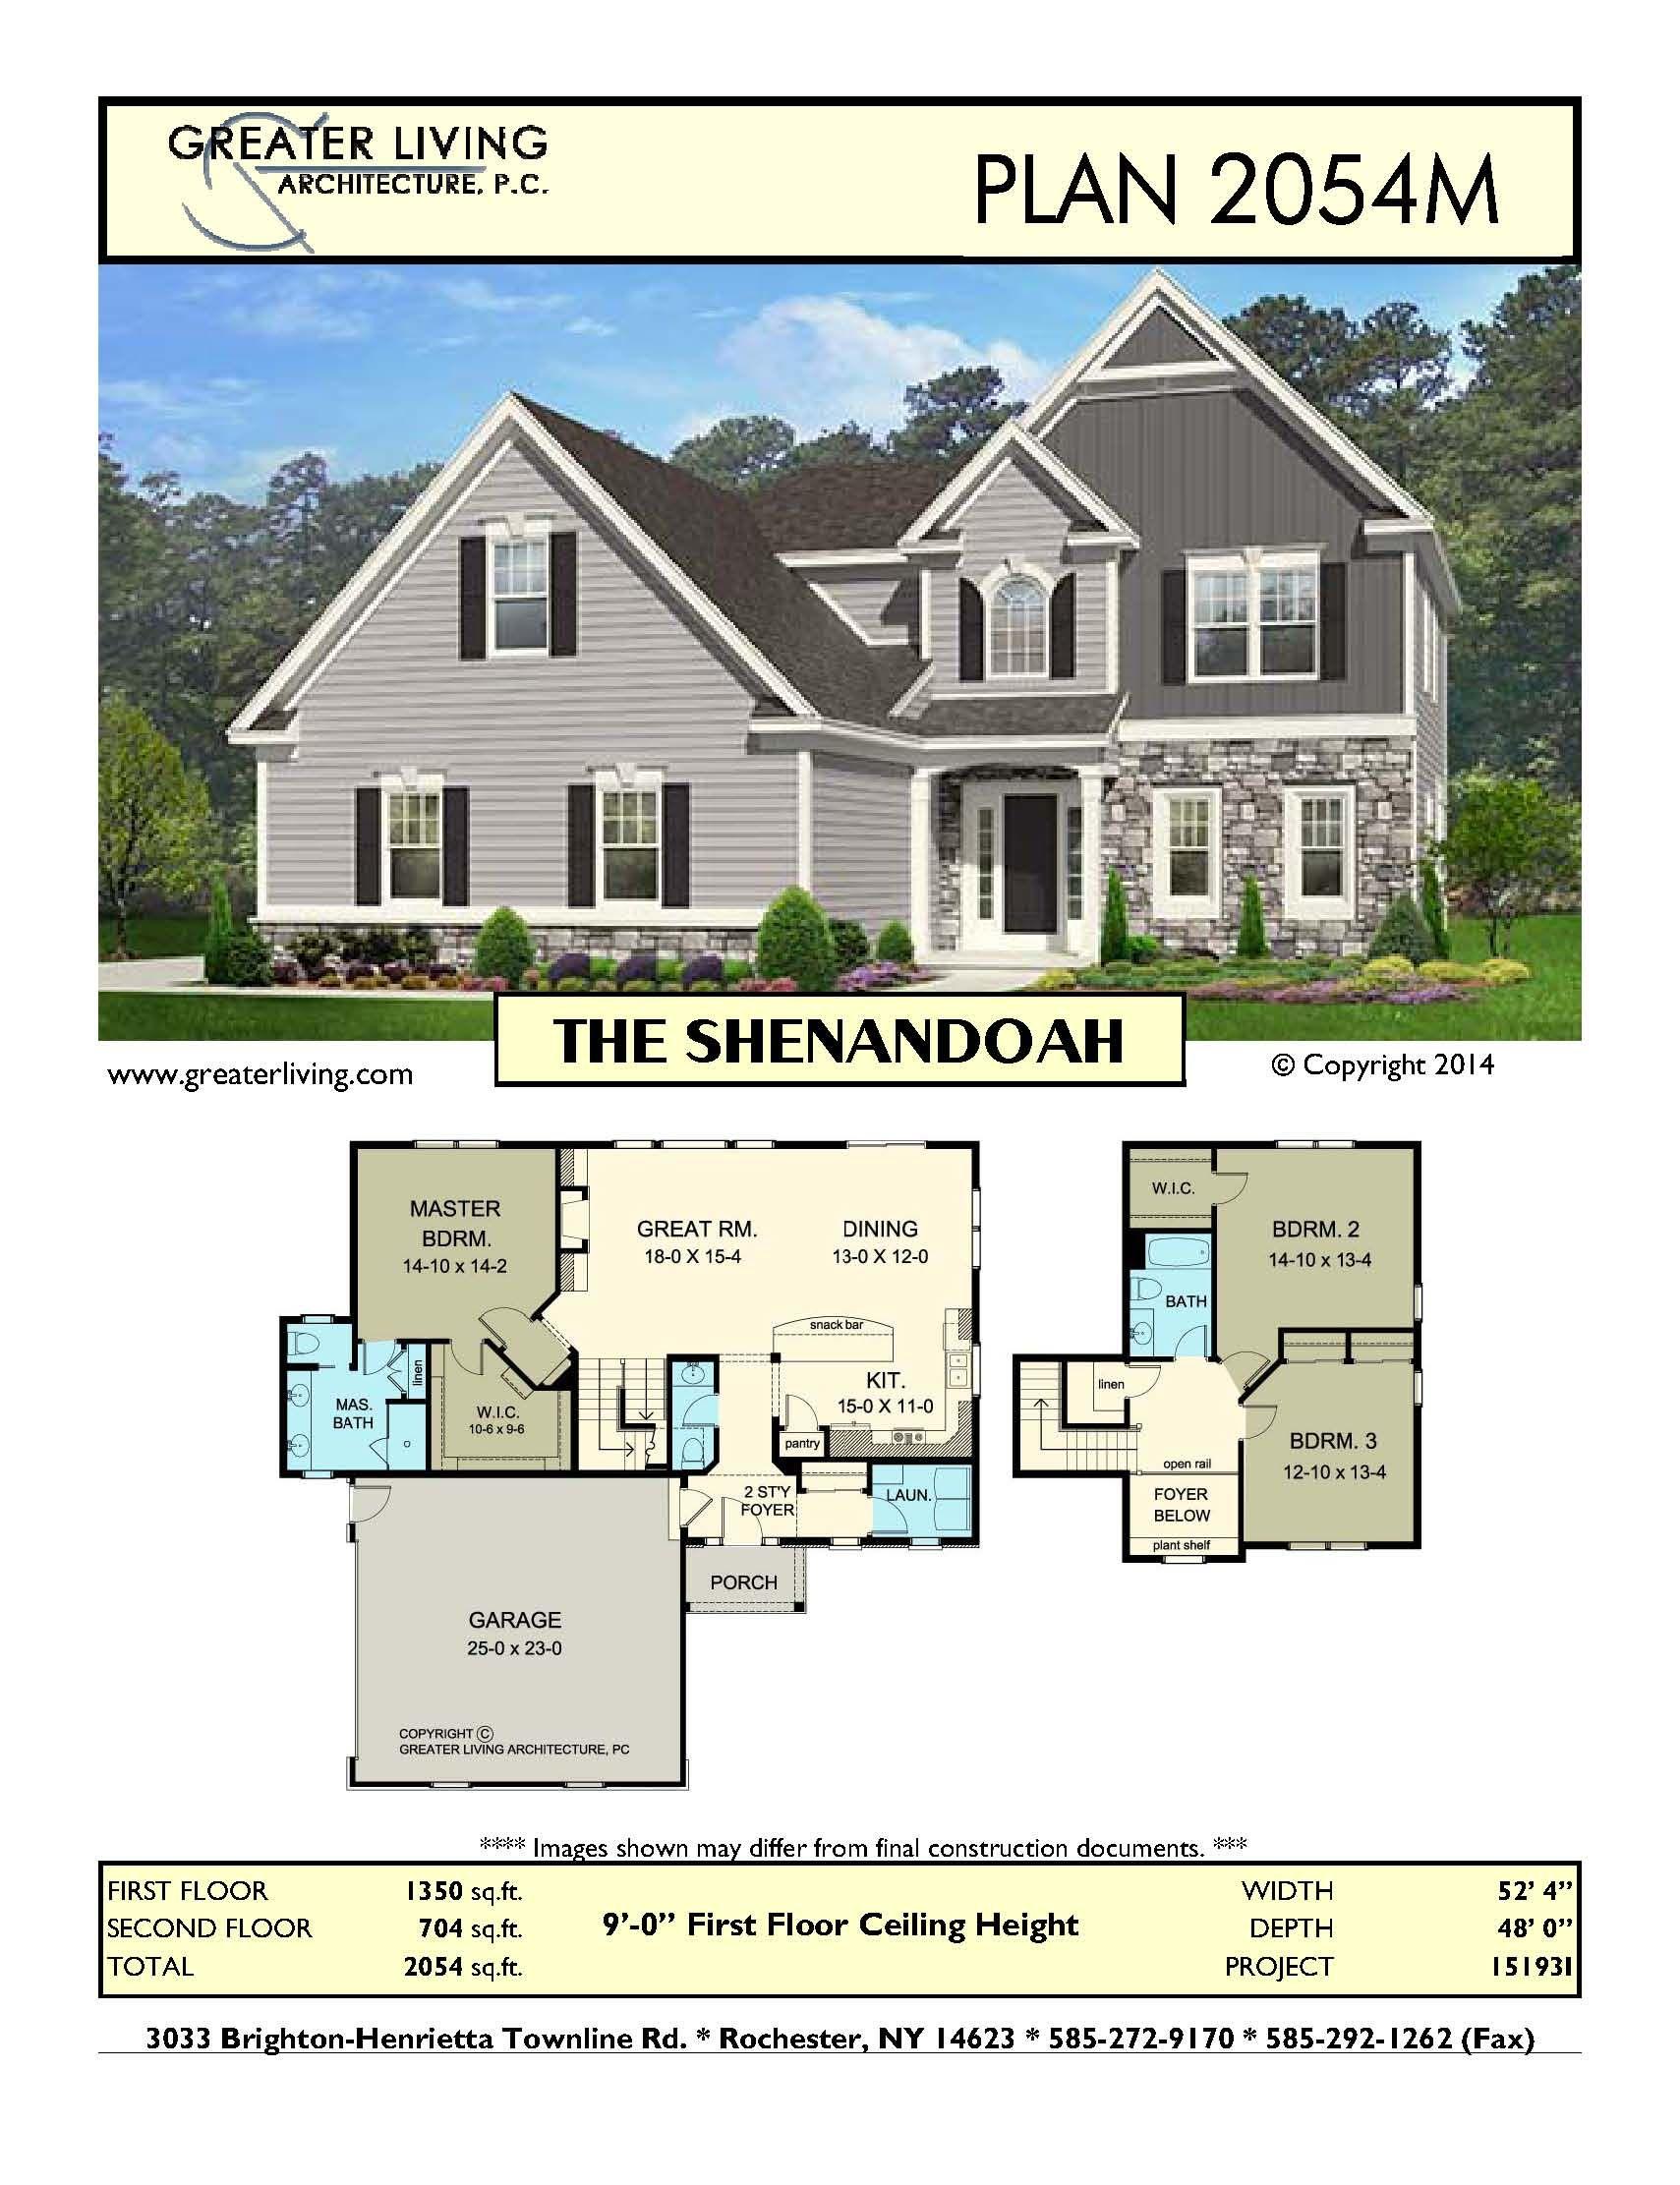 Plan 2054m The Shenandoah House Plans Two Story House Plans 1st Floor Master Greate House Plans Residential Architecture Residential Architecture Plan